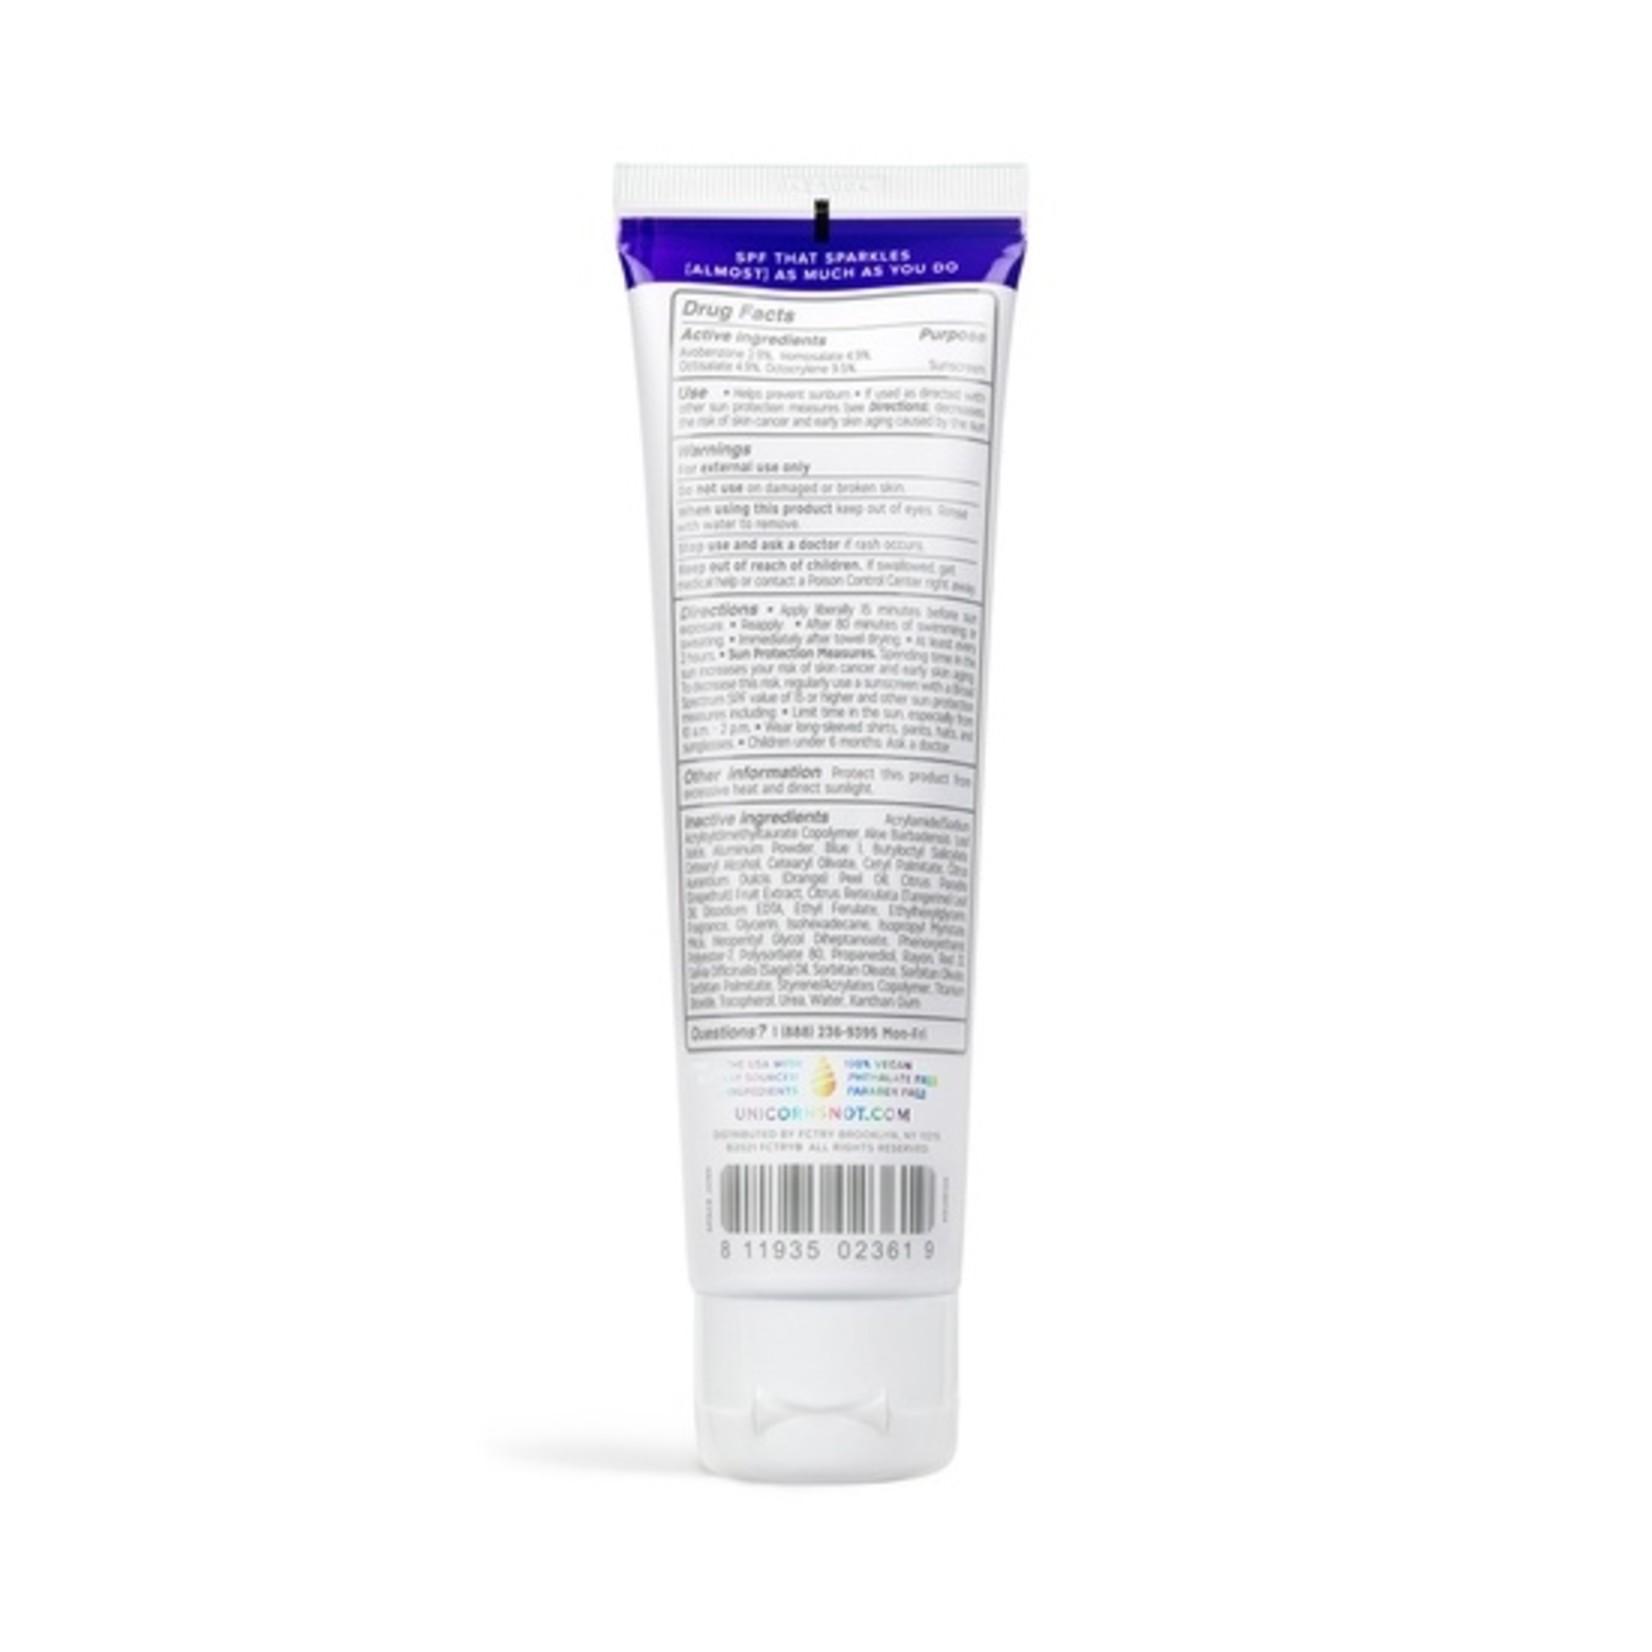 FCTRY Unicorn Snot Bio Glitter SPF 30 Sunscreen